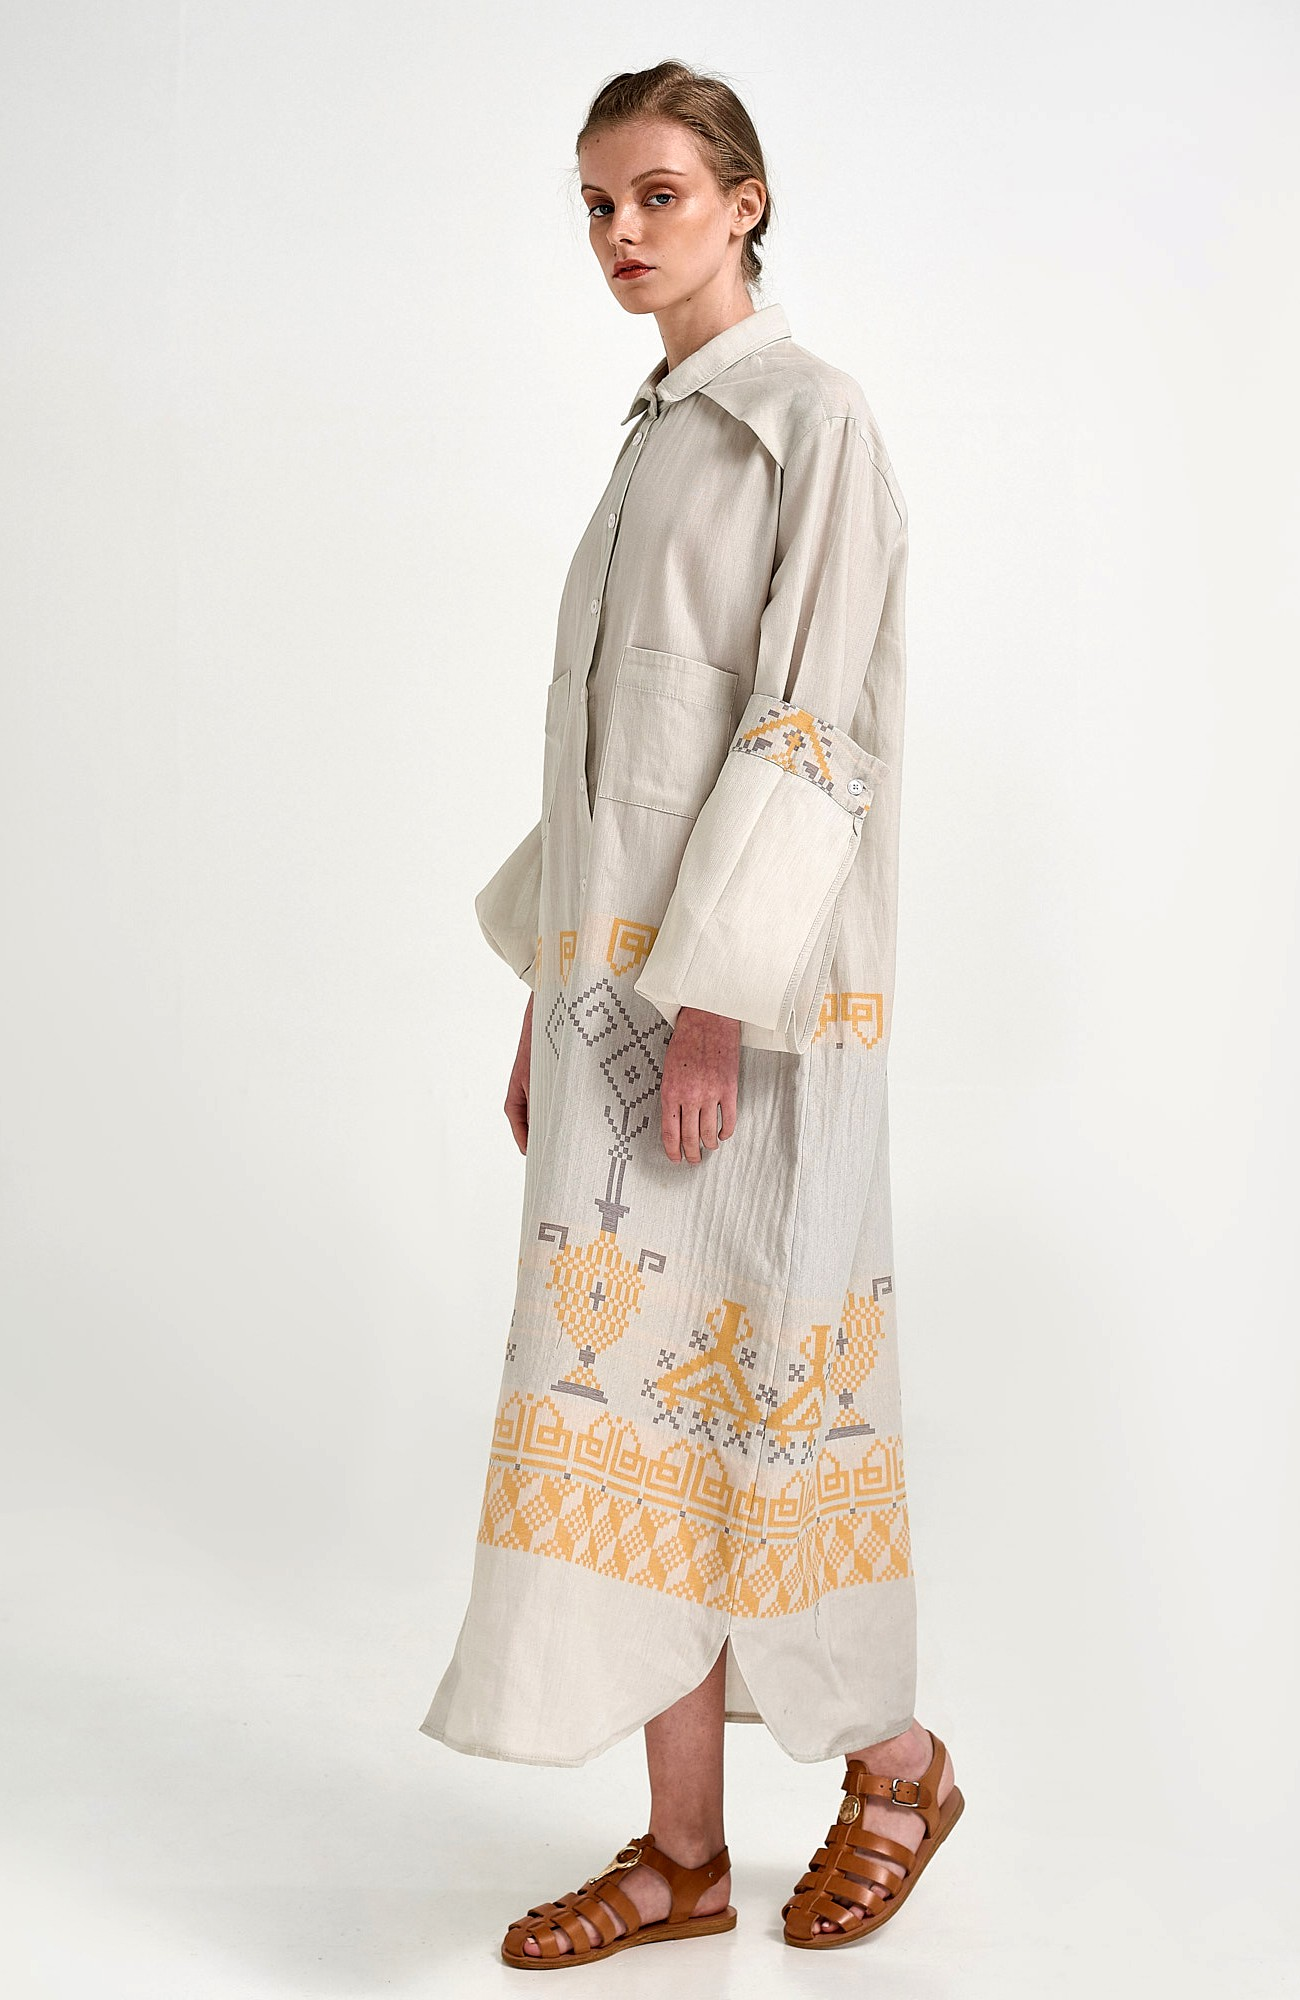 ERGON MYKONOS Corinna Dress